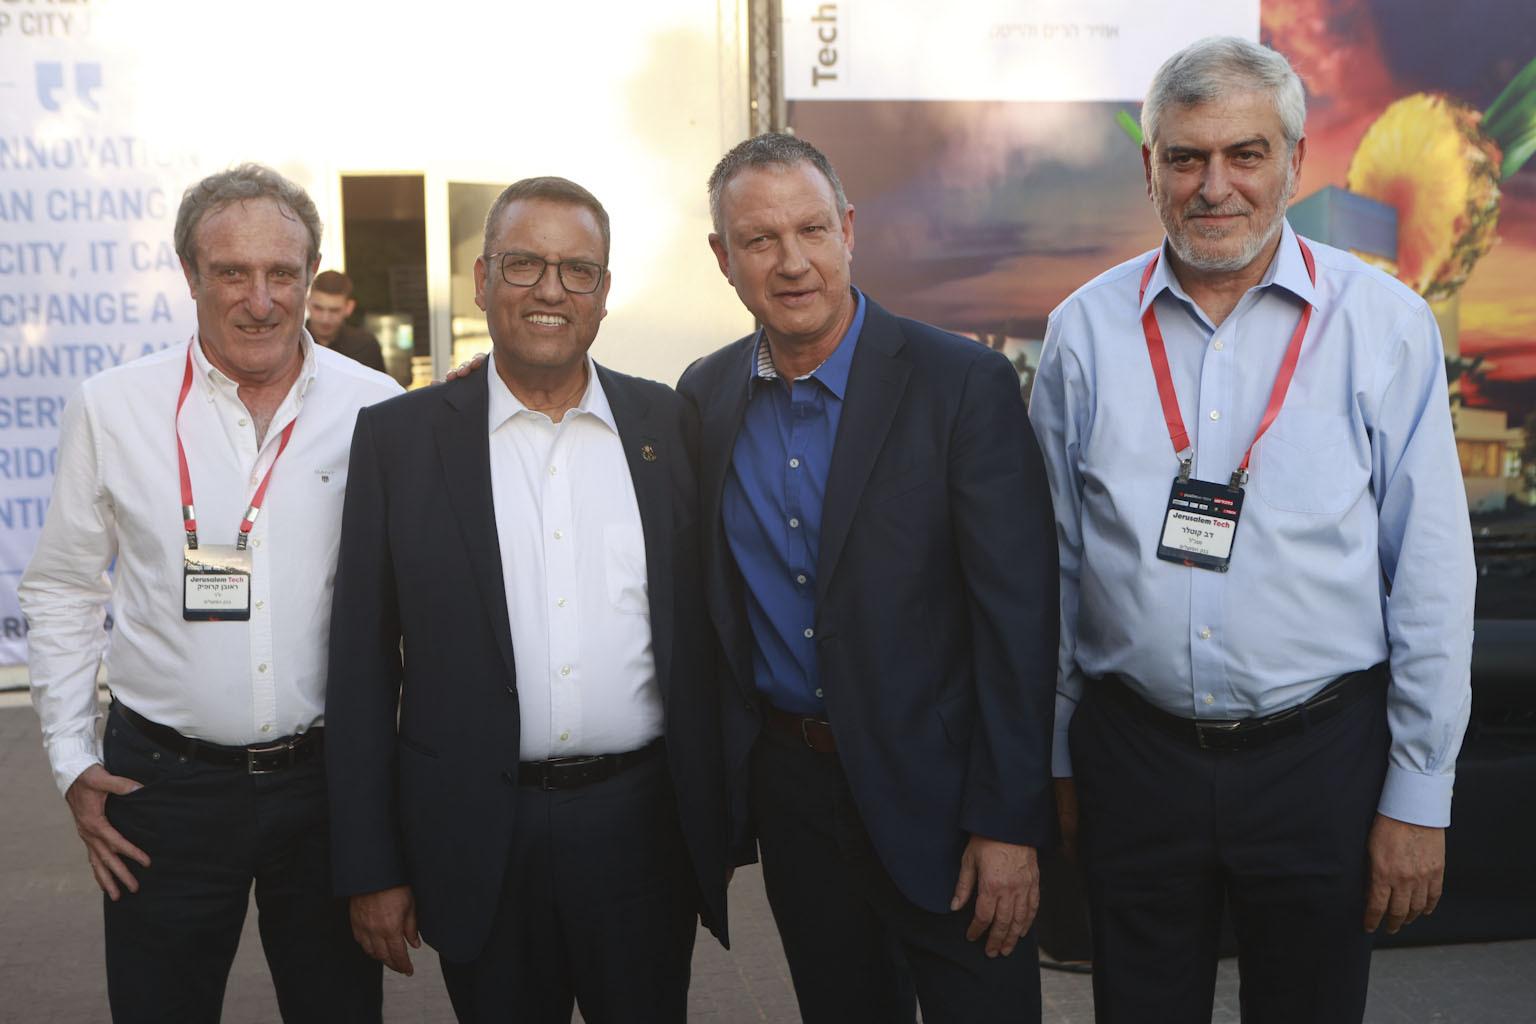 Bank Hapoalim CEO Dov Kotler (from right), Erel Margalit, Jerusalem mayor Moshe Lion and Bank Hapoalim Chairman Reuben Krupik. Photo: Amit Shaal